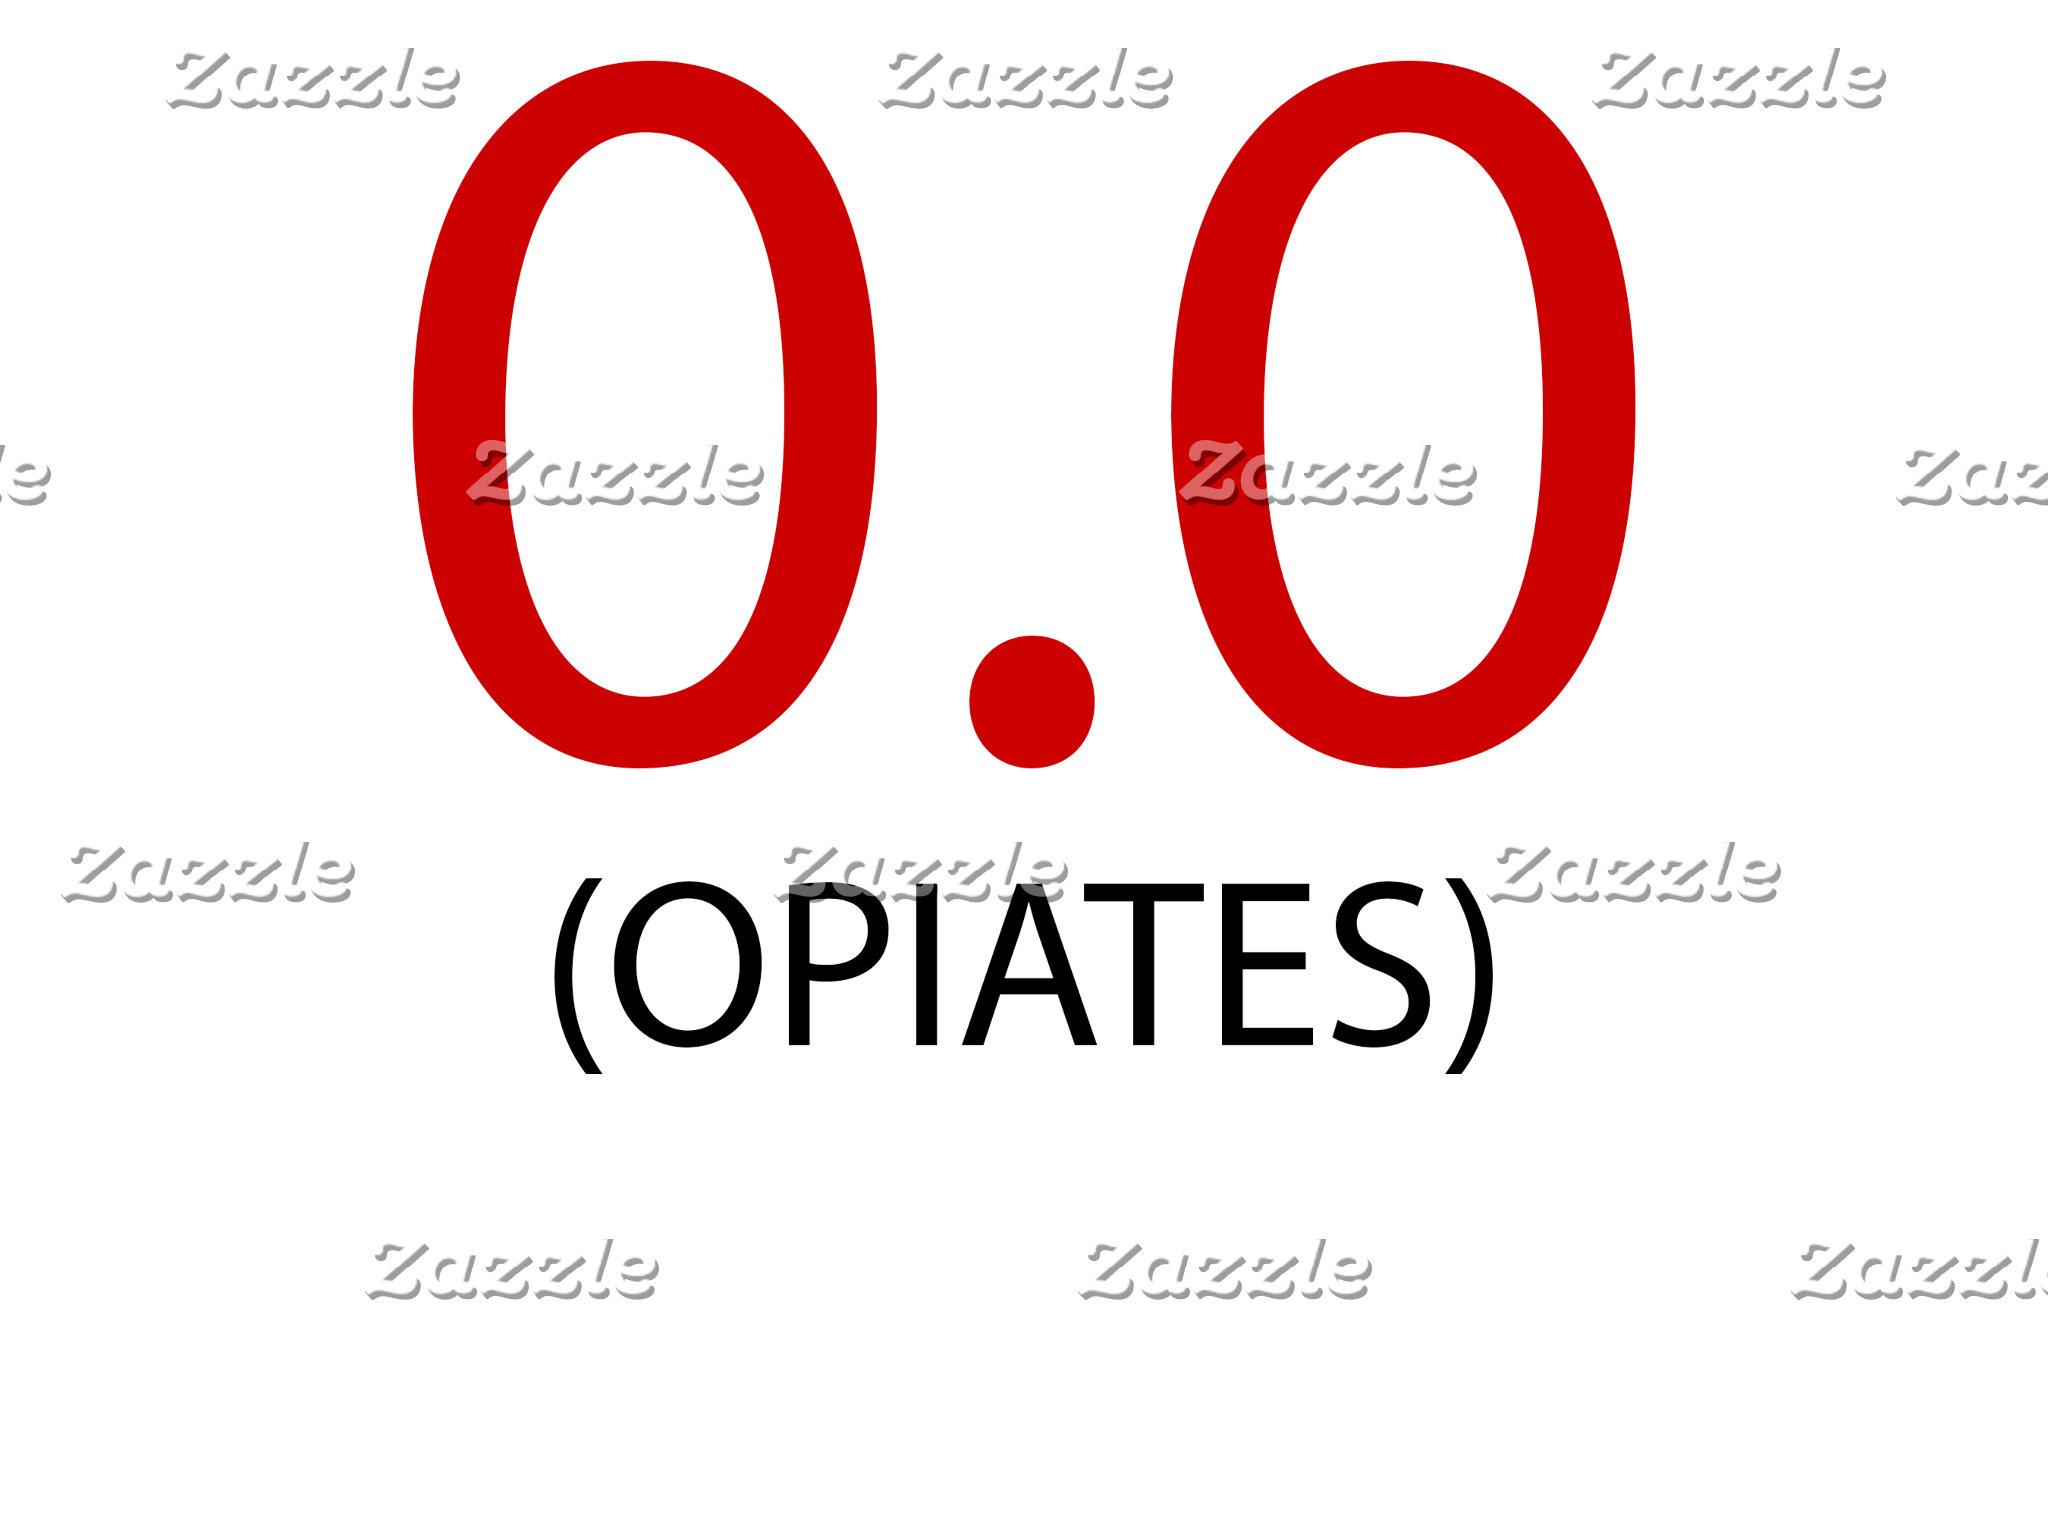 0.0 Opiates